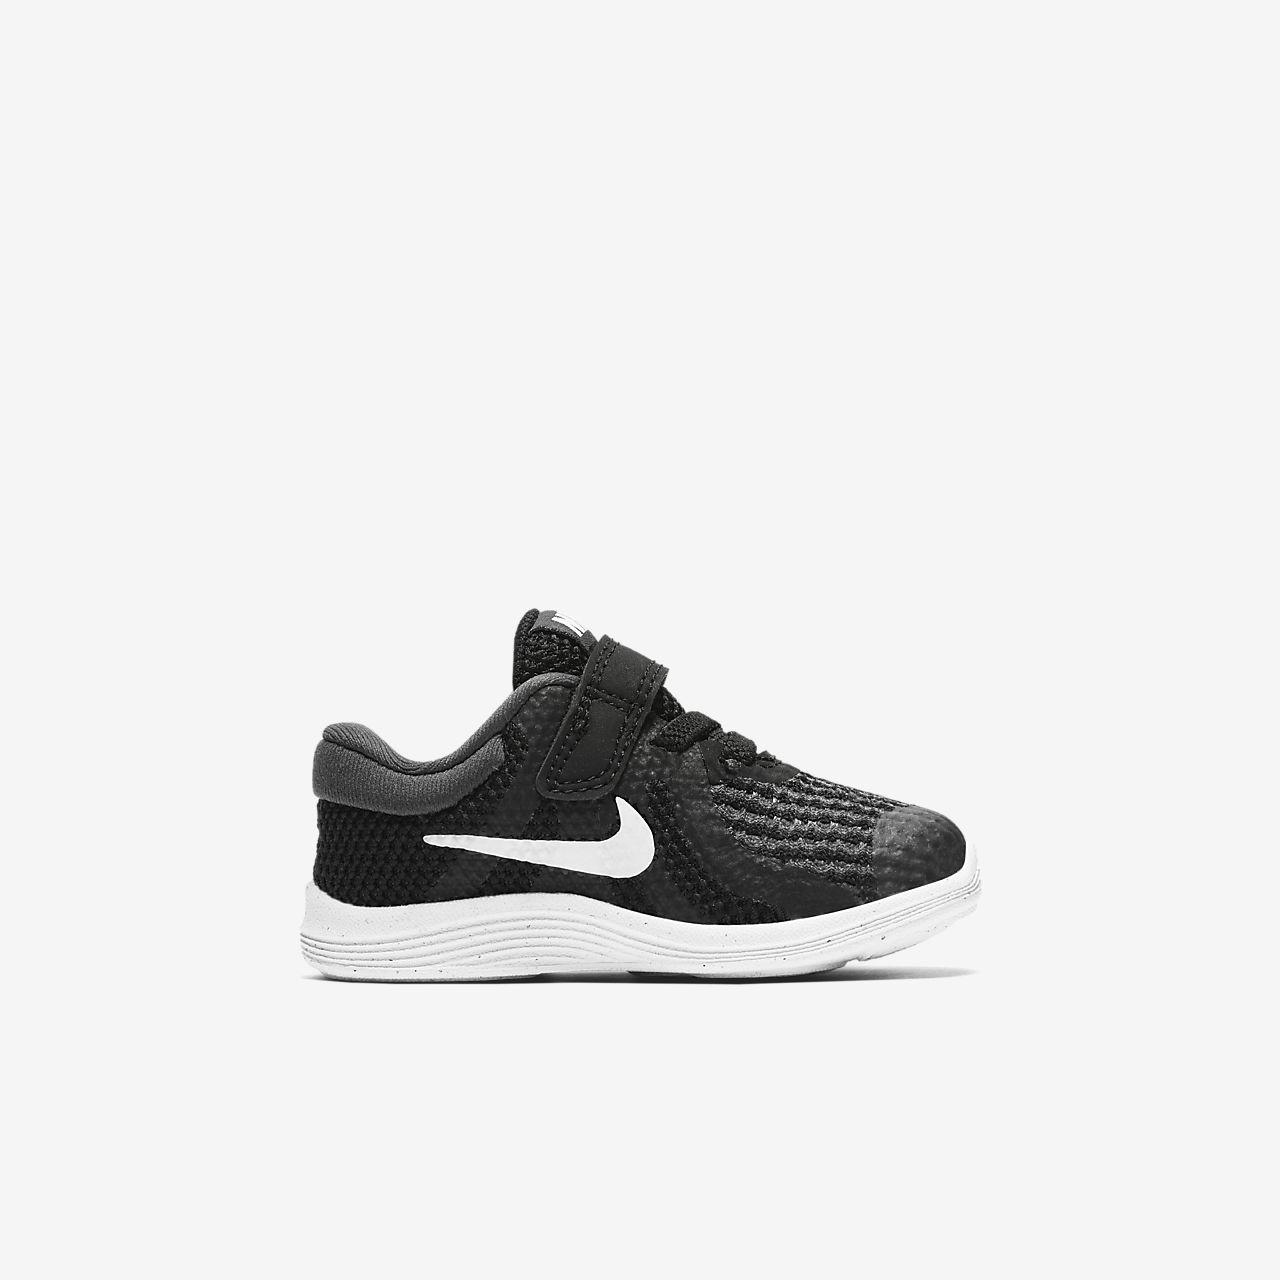 314d3ebd272 Nike Revolution 4 – sko til babyer/småbørn. Nike.com DK